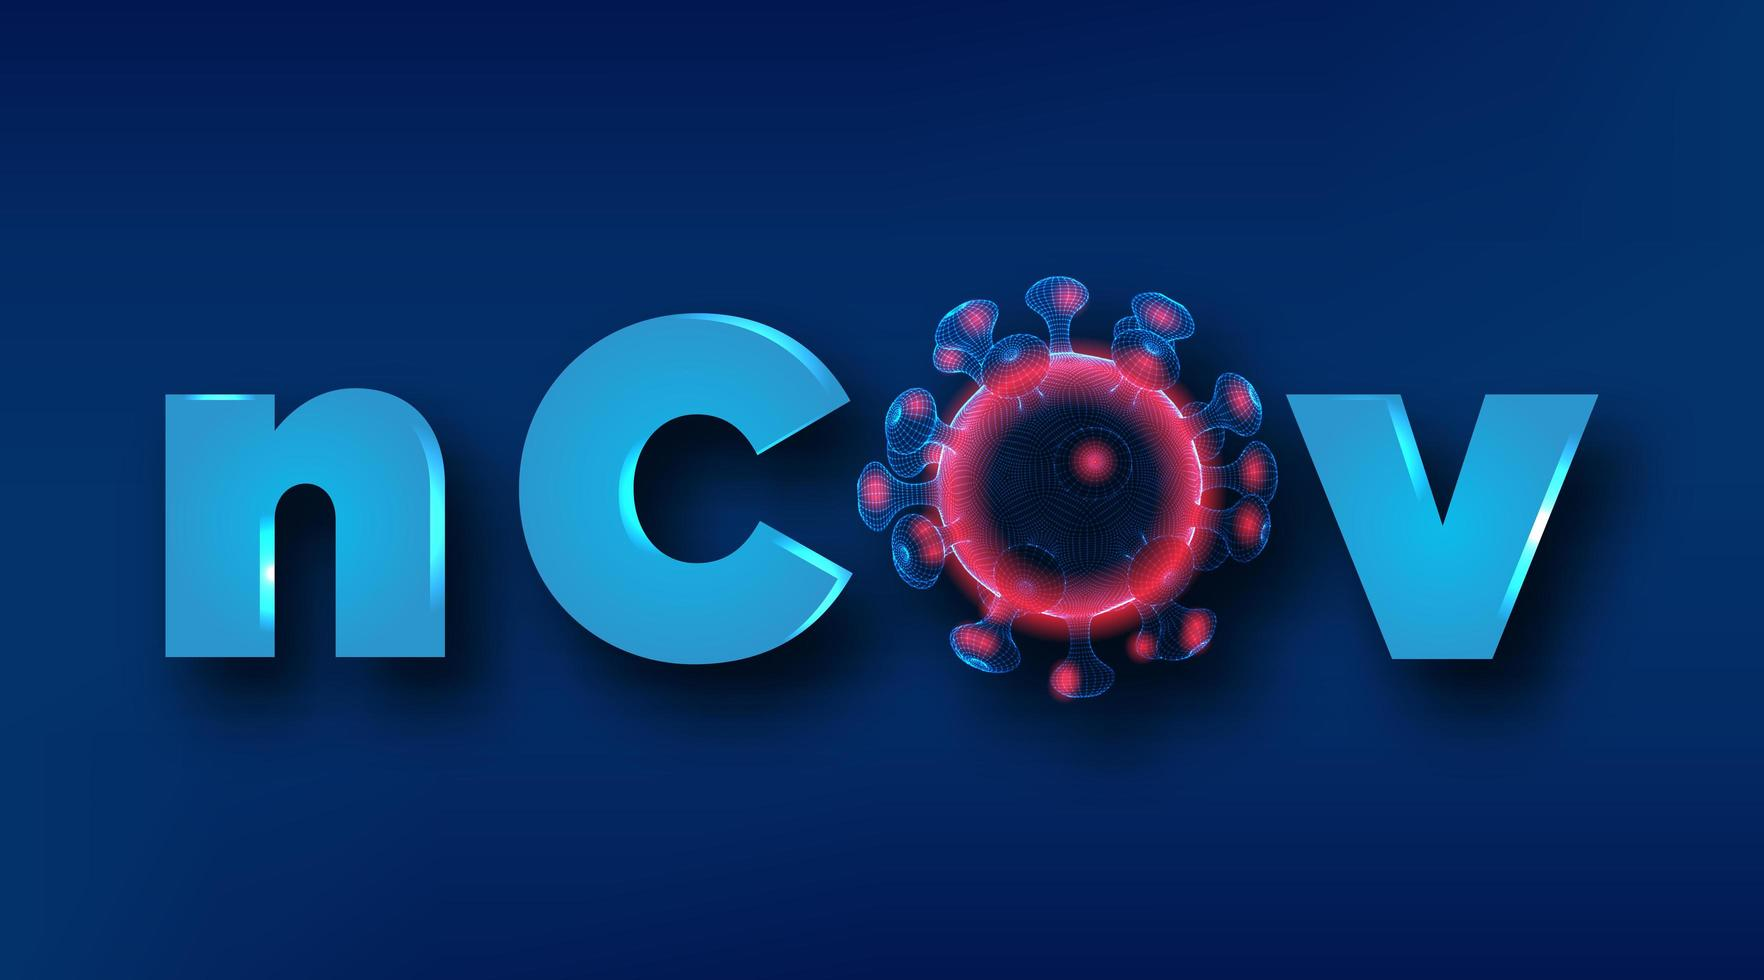 coronavirus draadframe virus met ncov-tekst vector